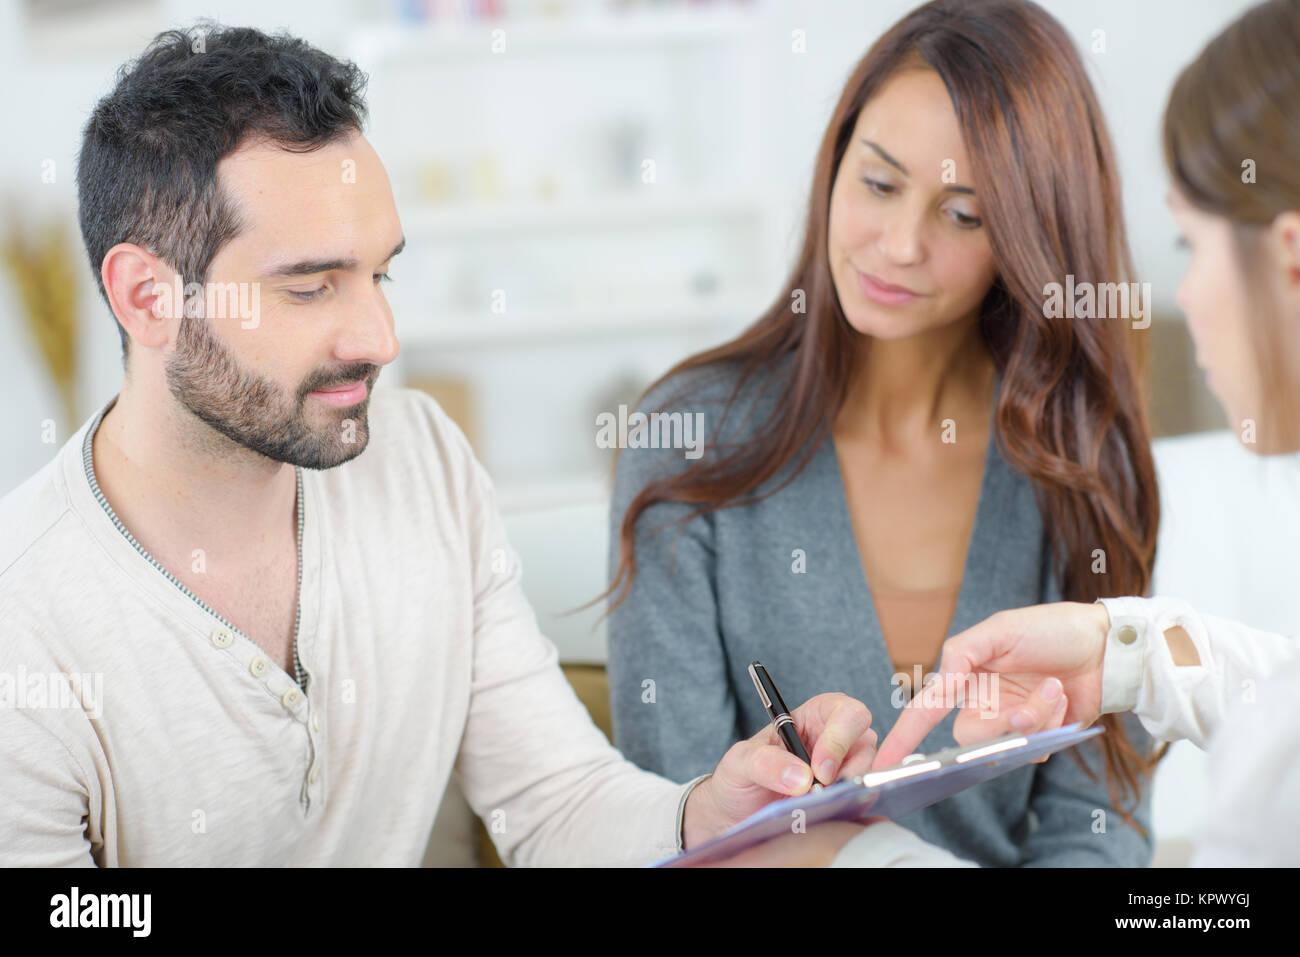 couple signing form - Stock Image